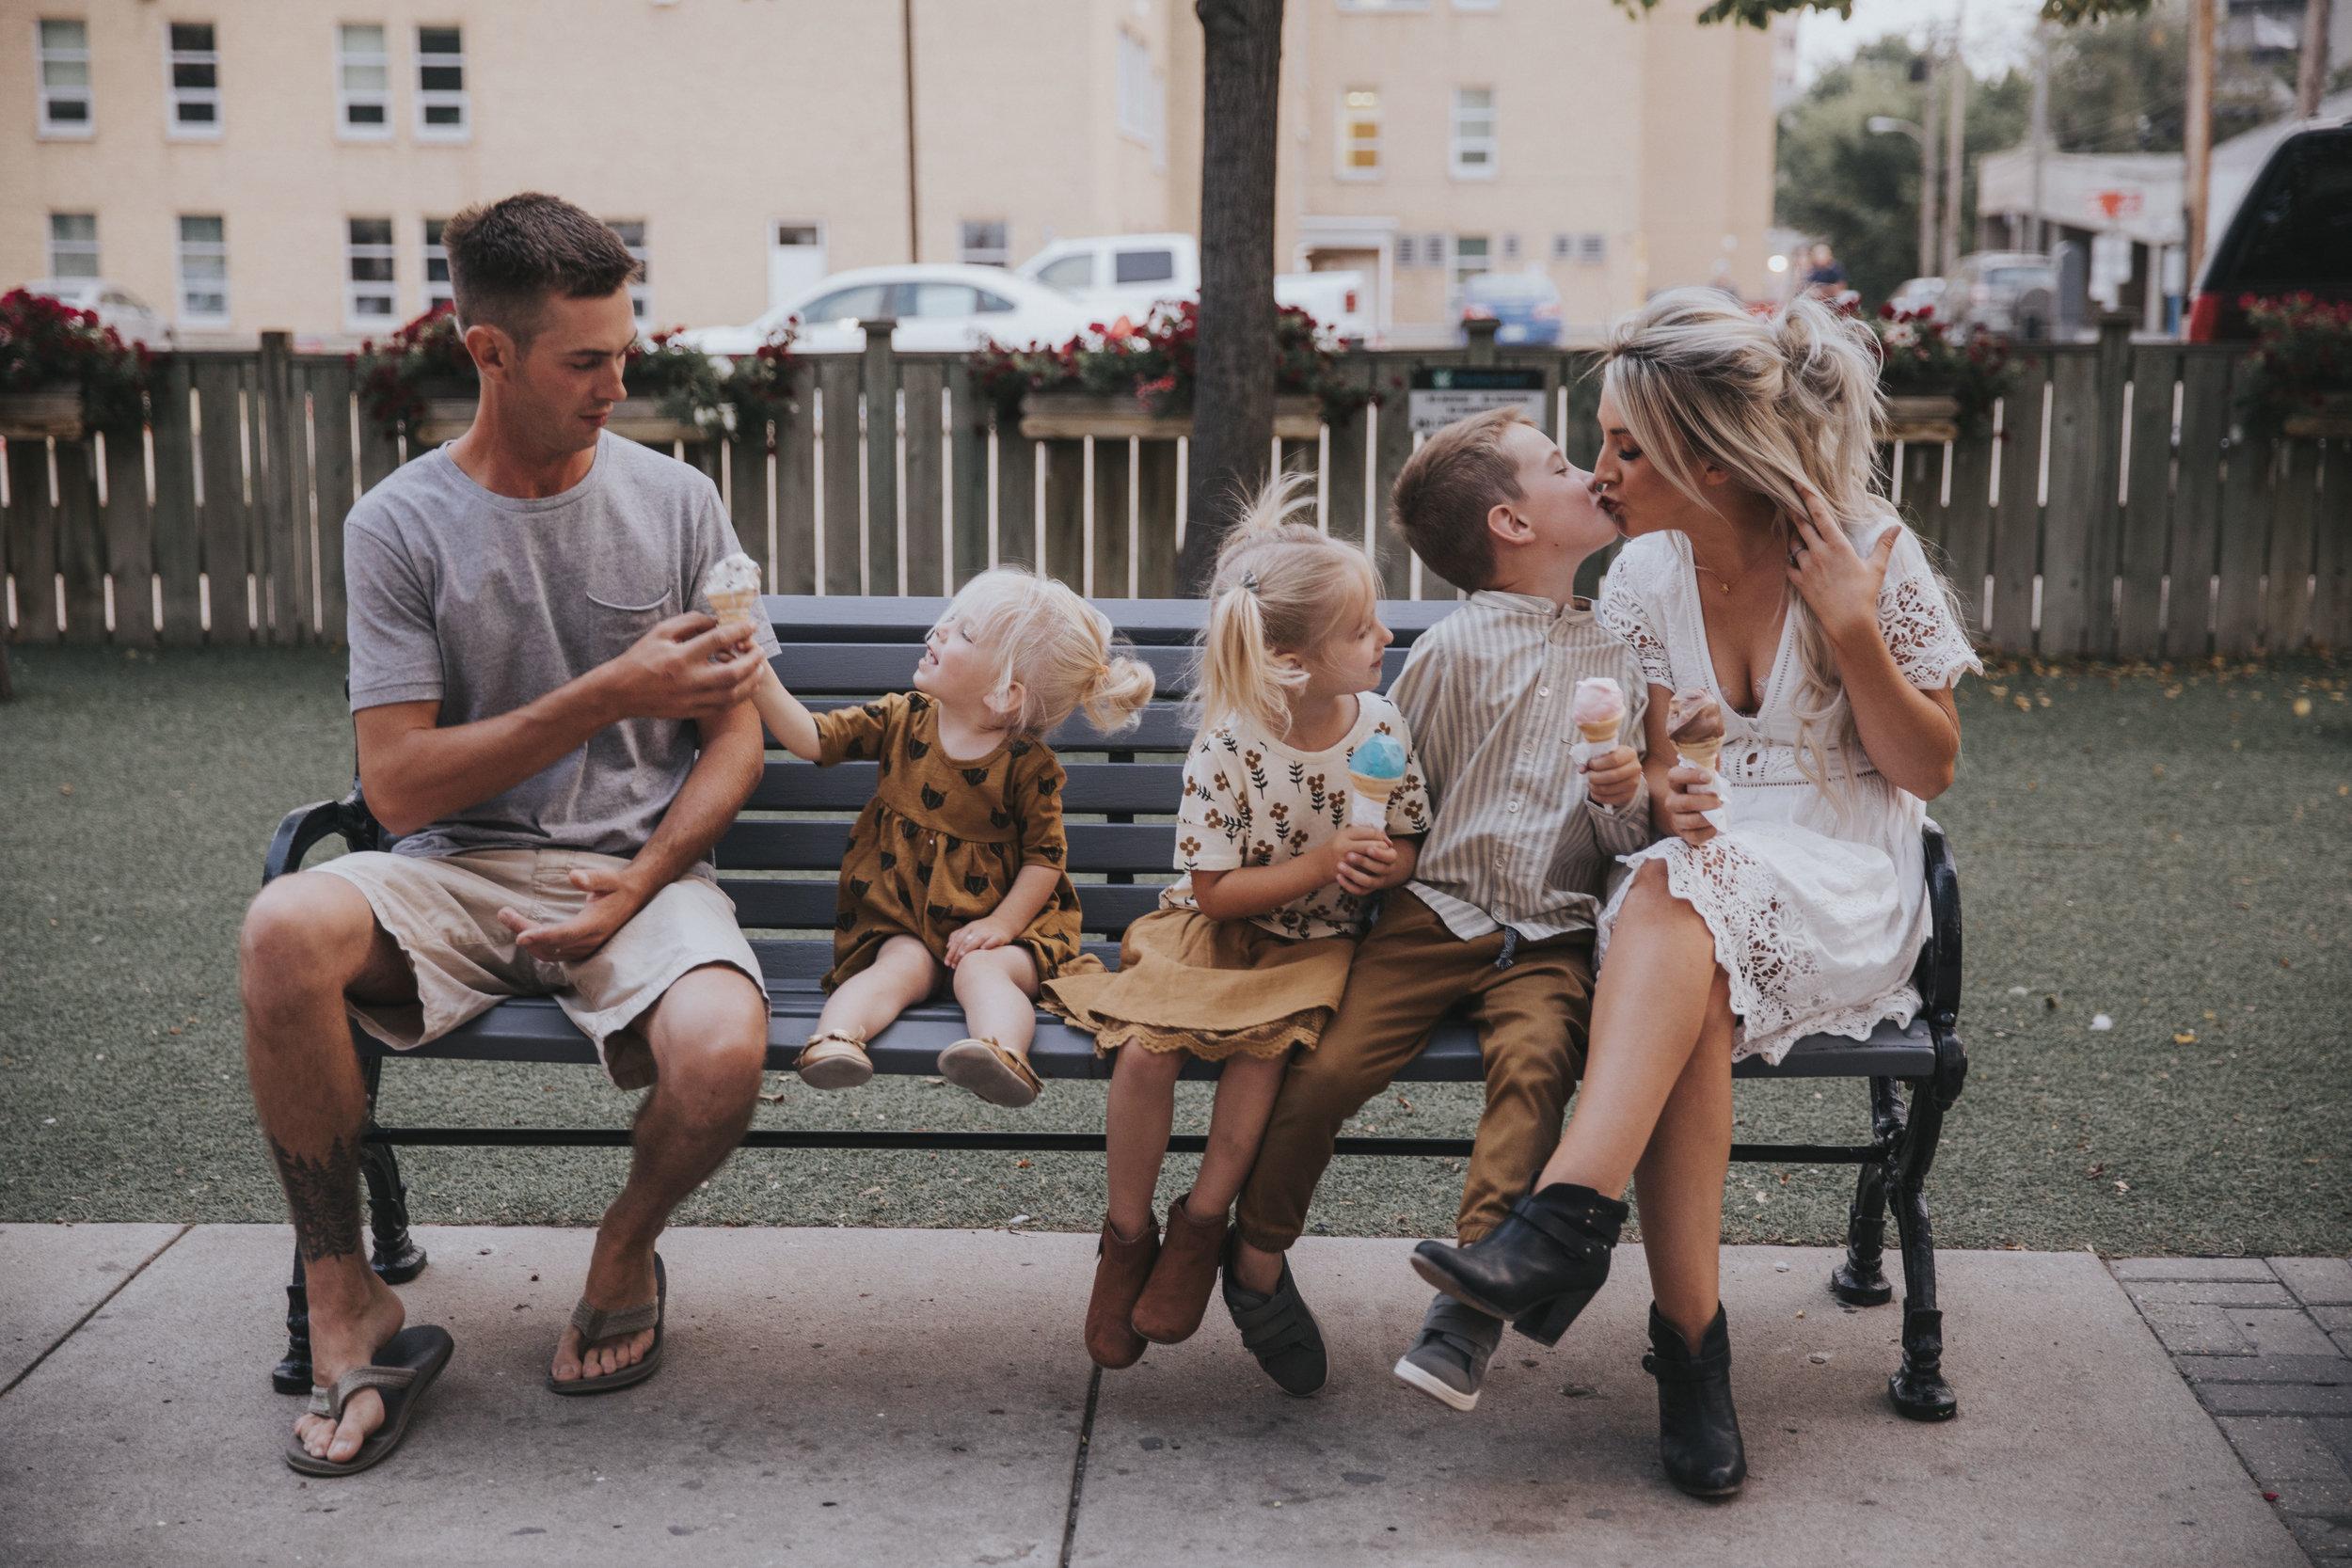 bowden family_Aug302017_2900.JPG